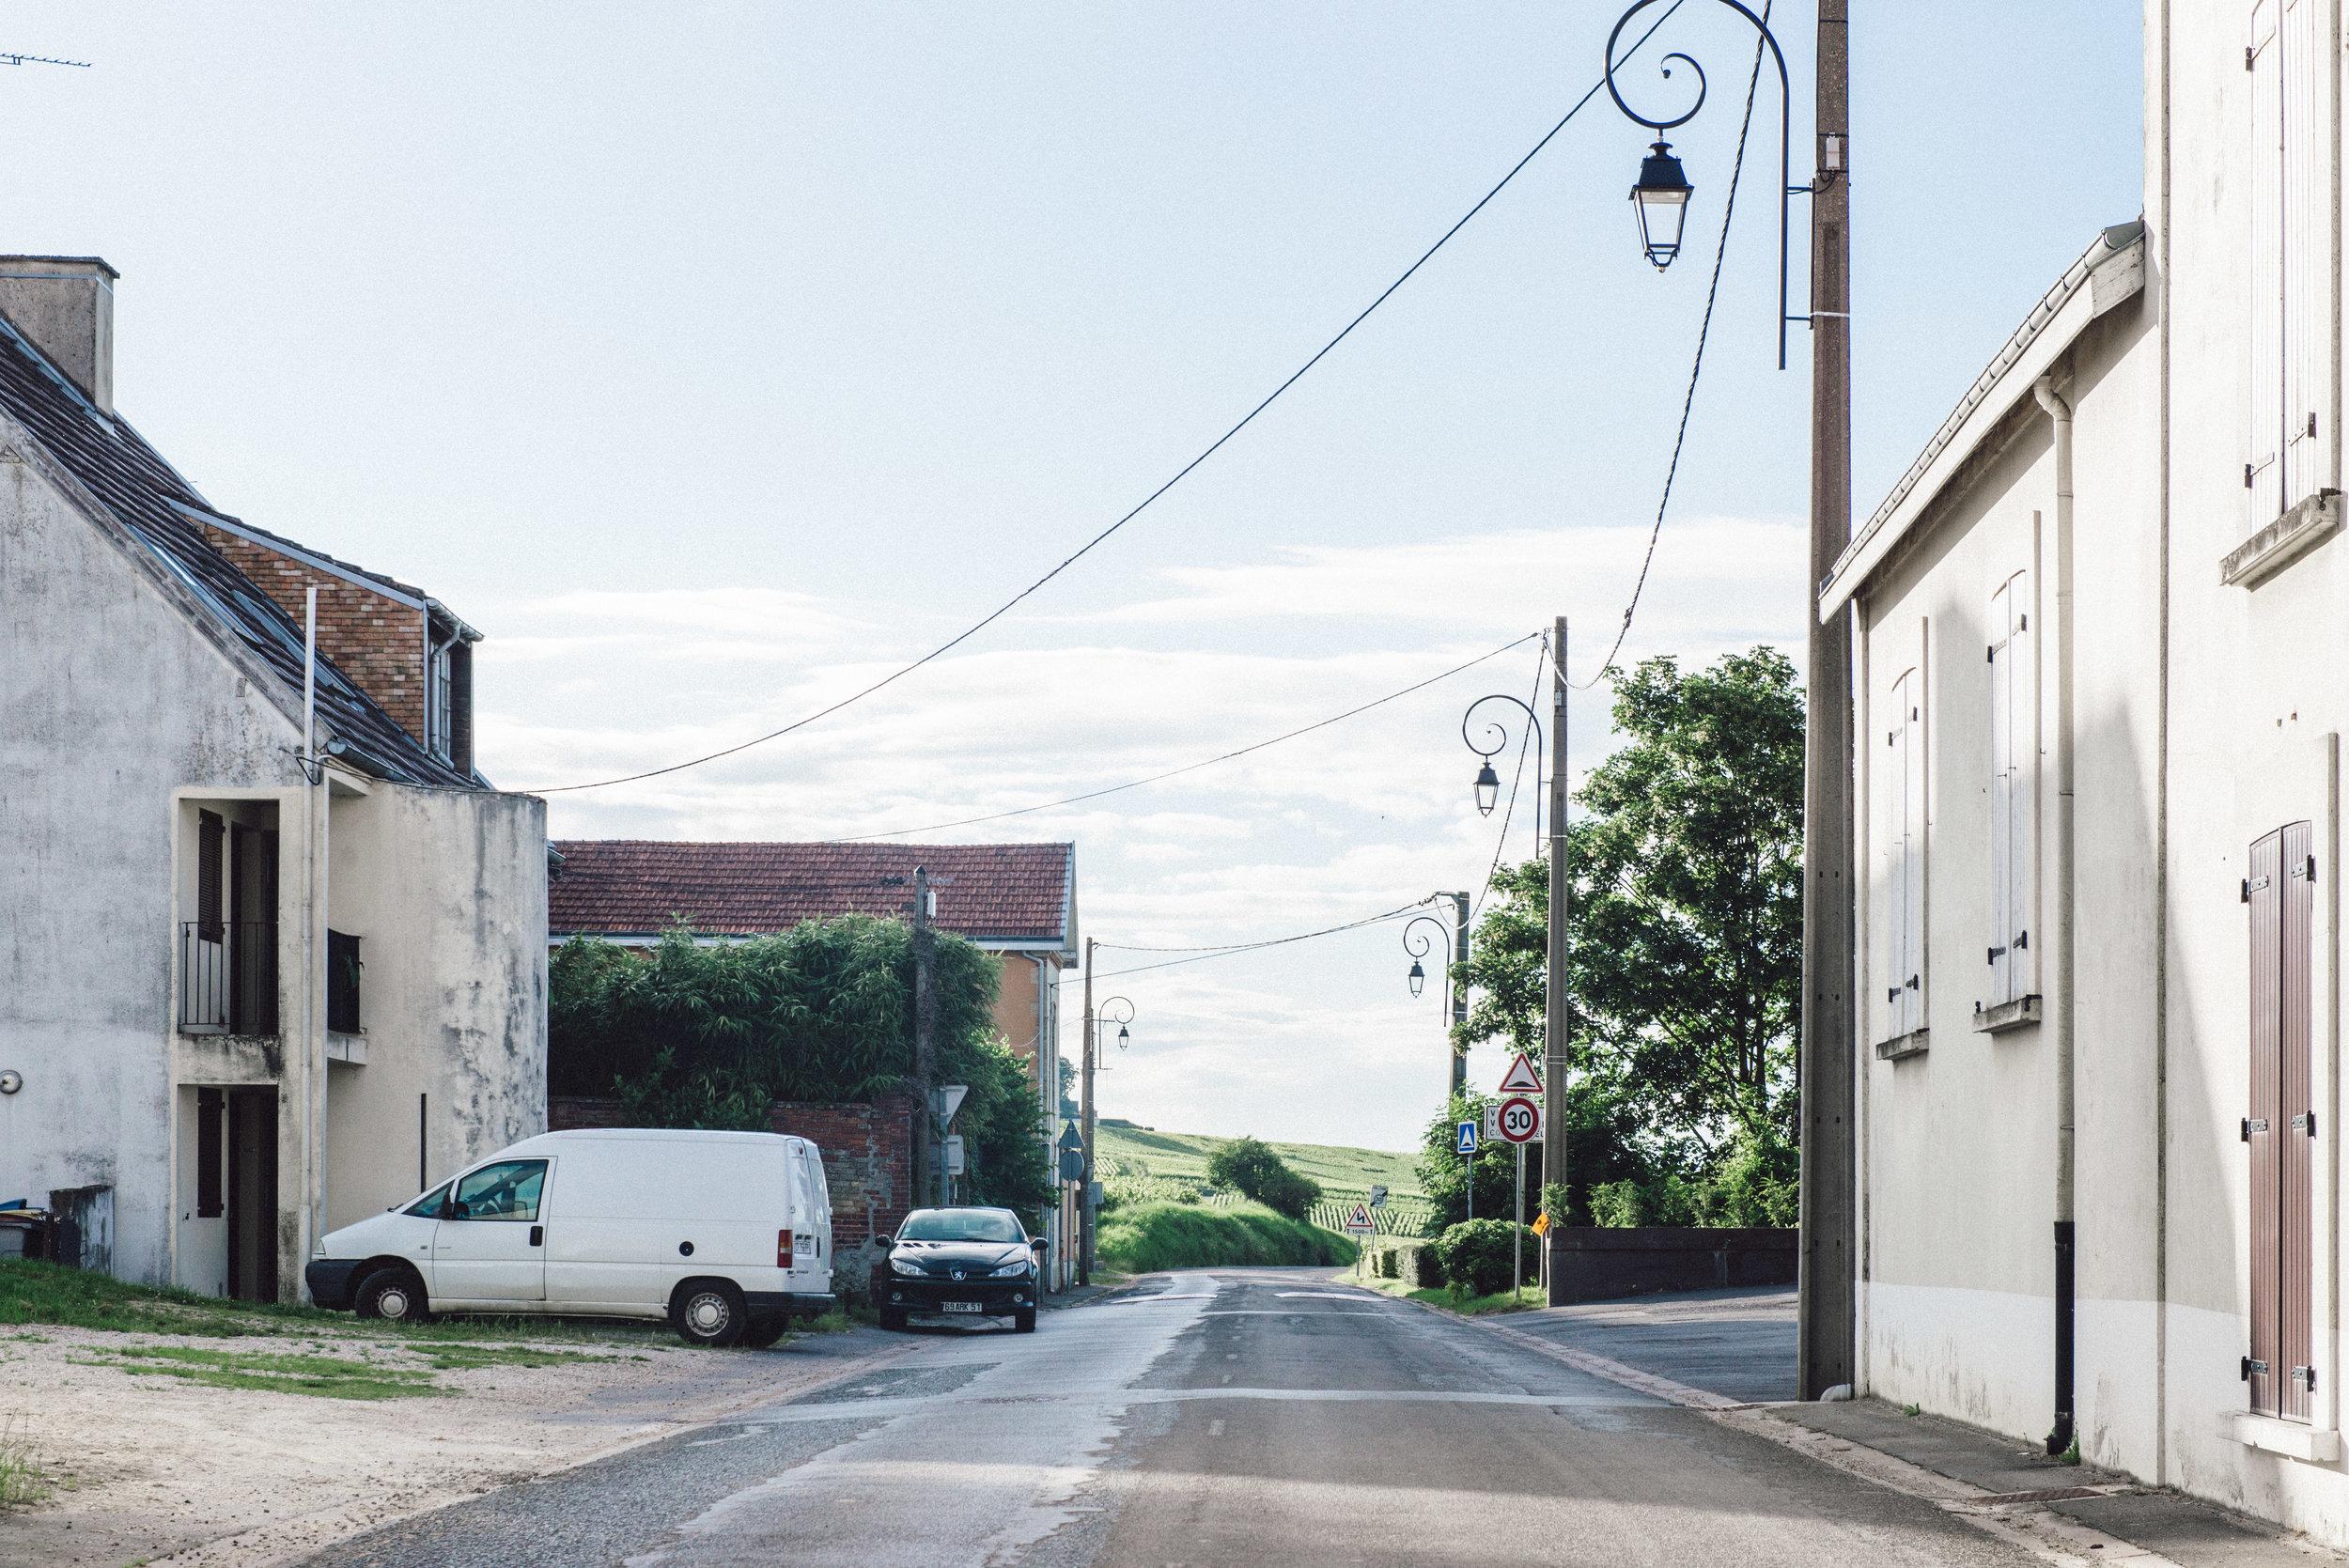 Carley Rudd Travel Photography - France